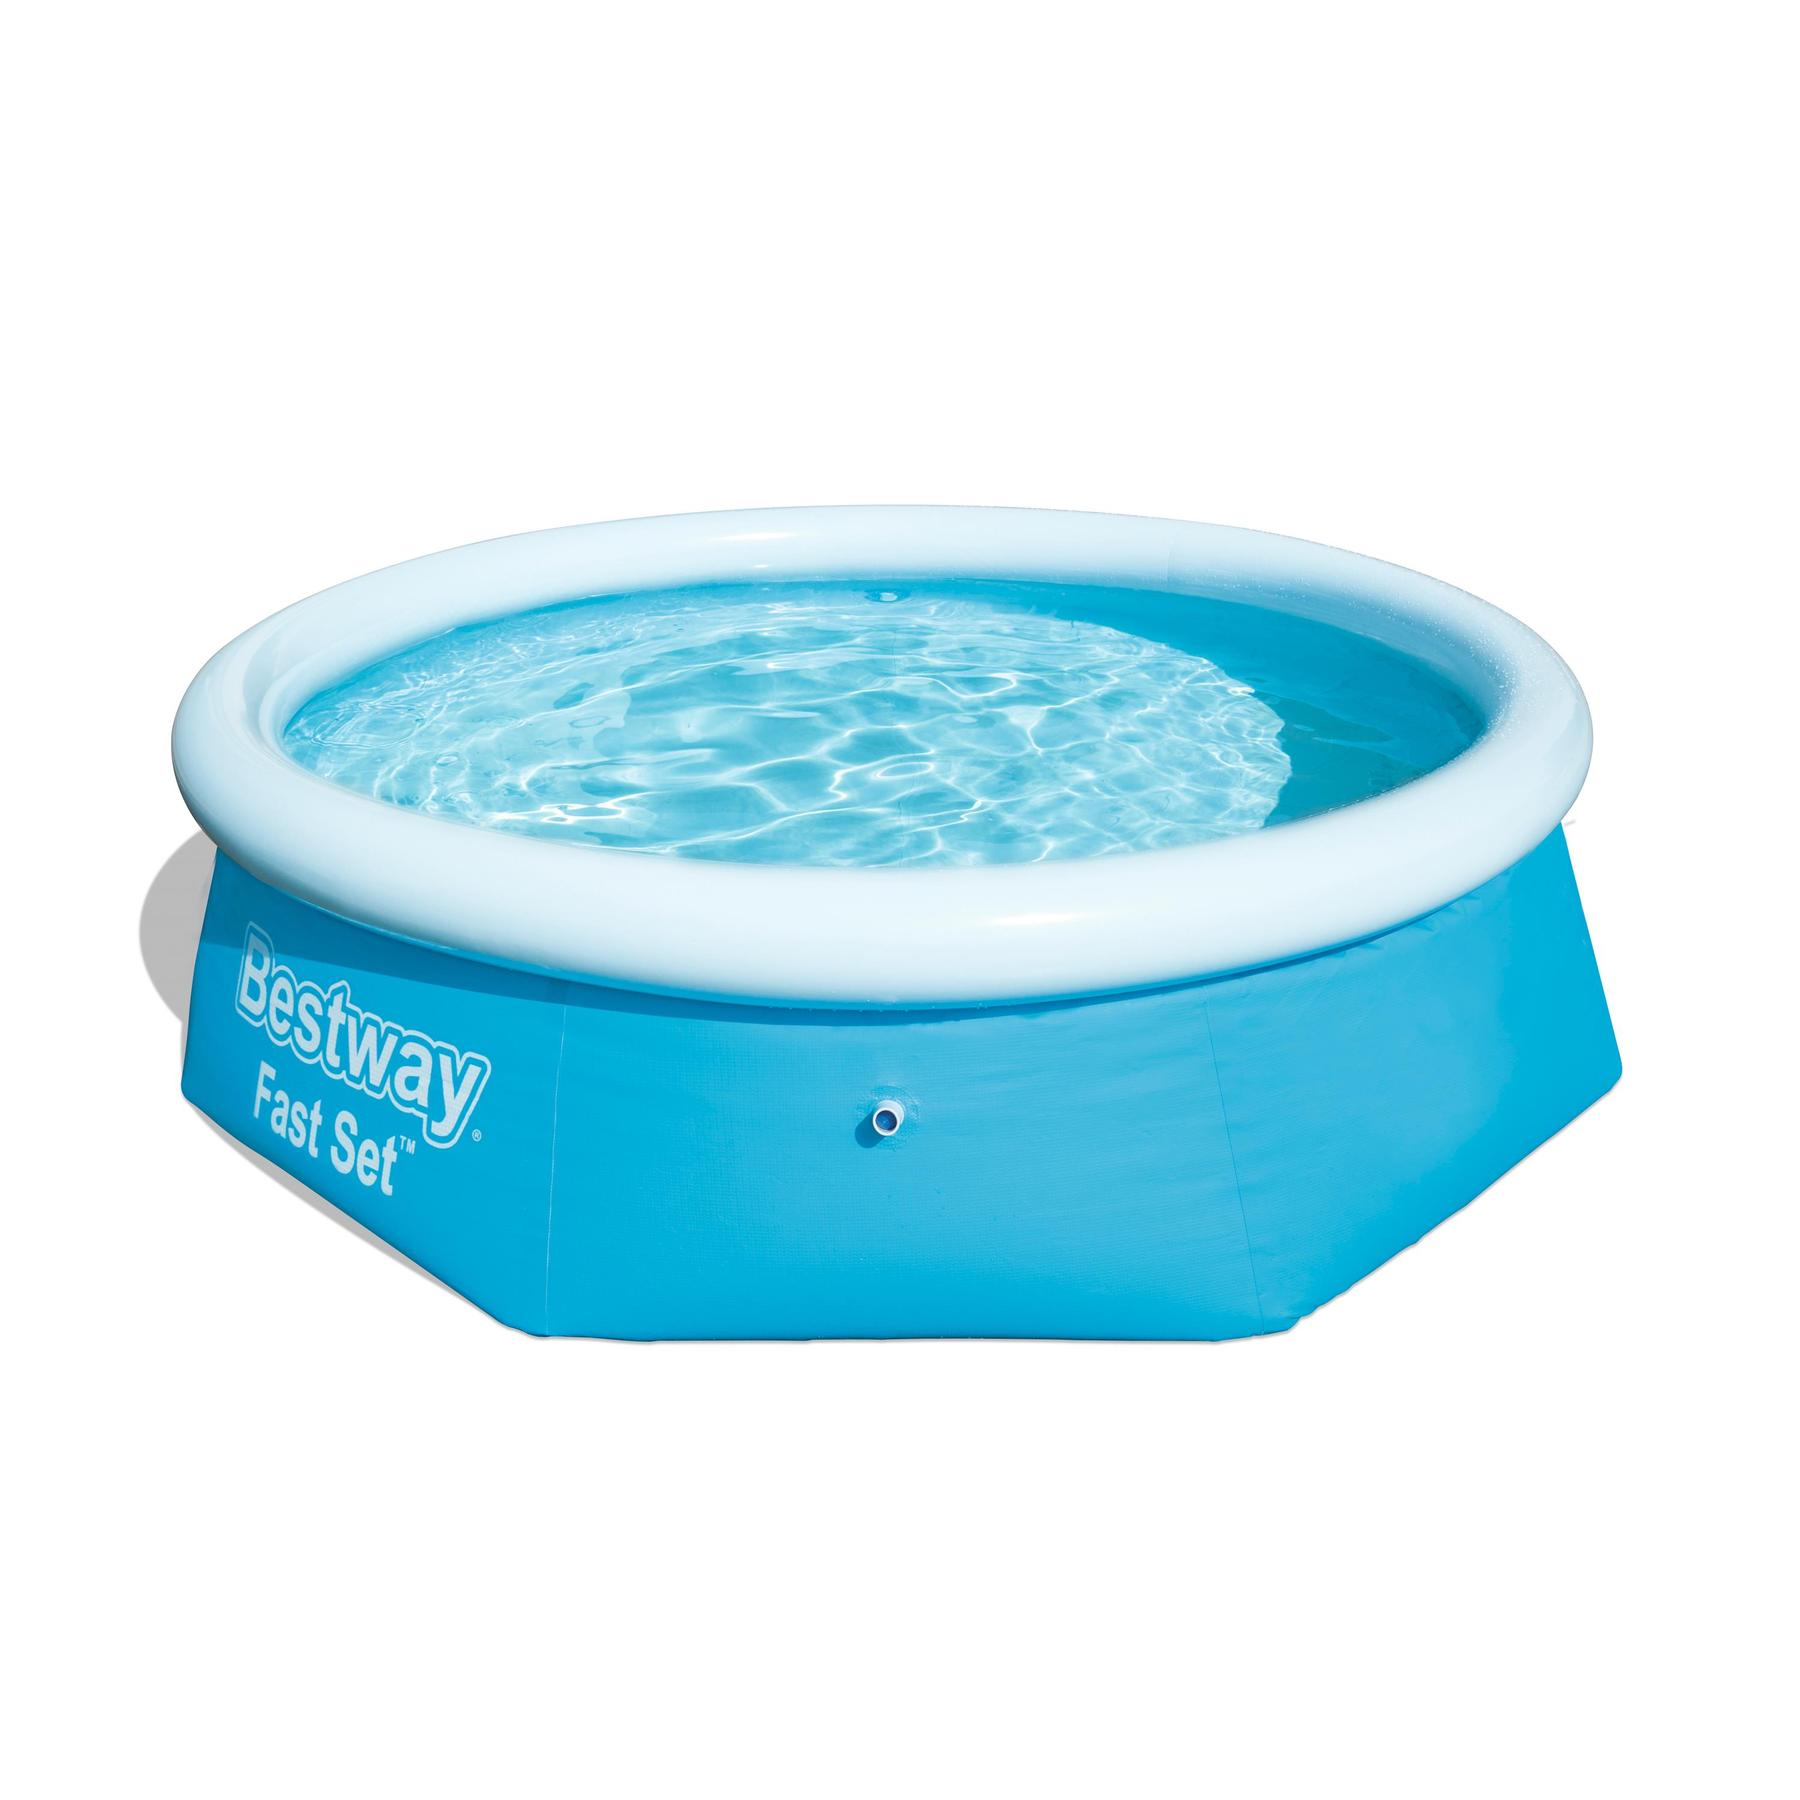 Round Pool Inflatable водораспорный Children's Fast Set 244 х66 Cm, 2300 L, Bestway, Item No. 57265/57008